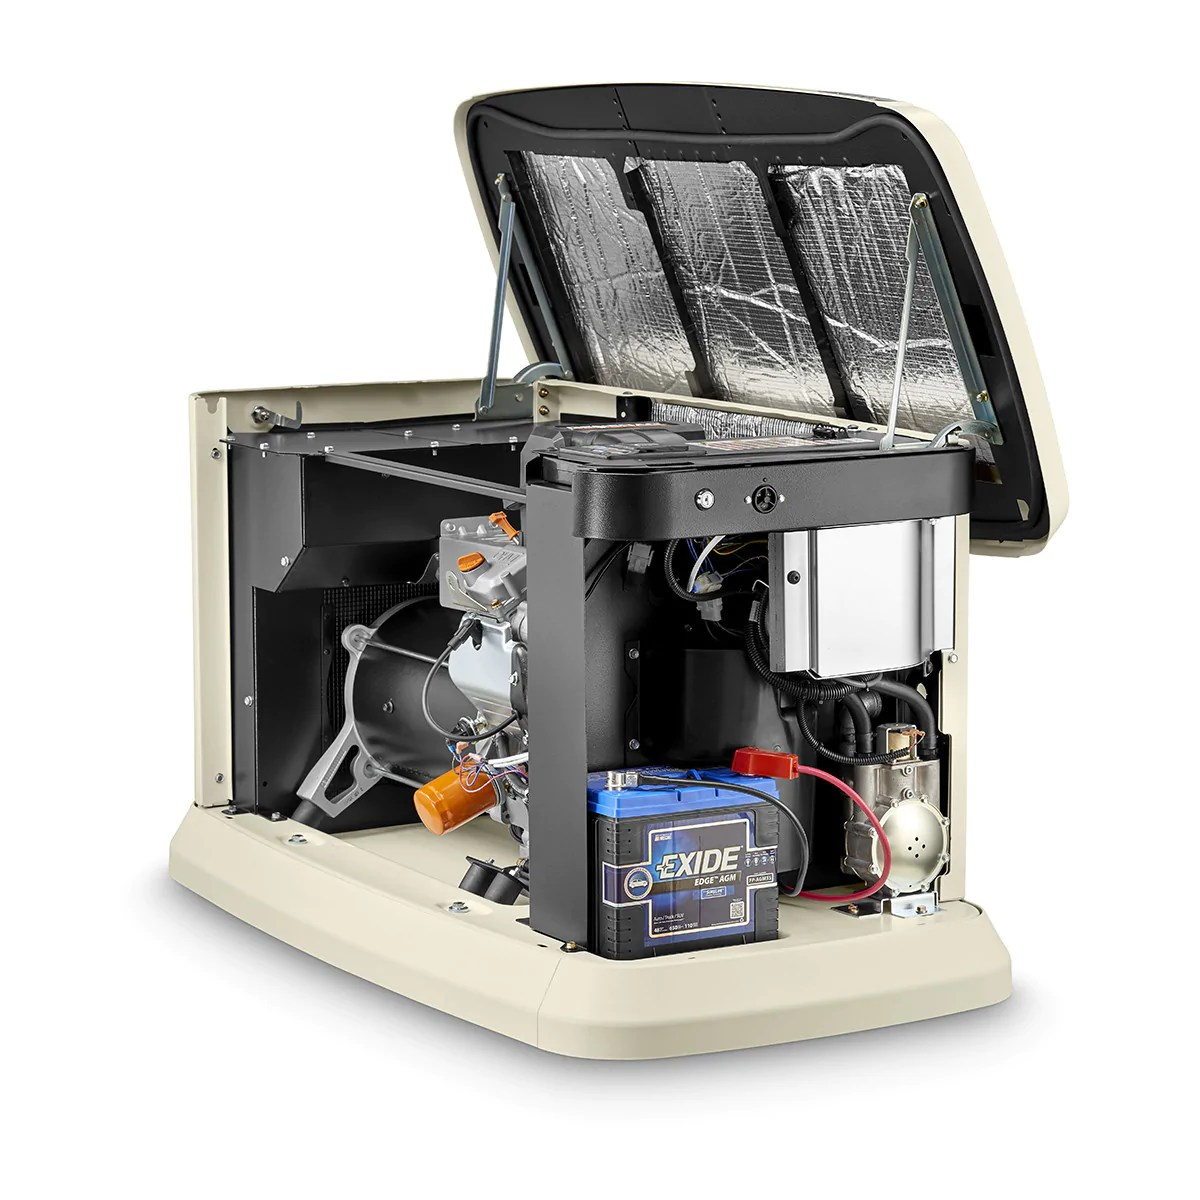 10kw Standby Generator Wiring Diagram Generac Guardian 7042 22kw Aluminum Automatic Standby